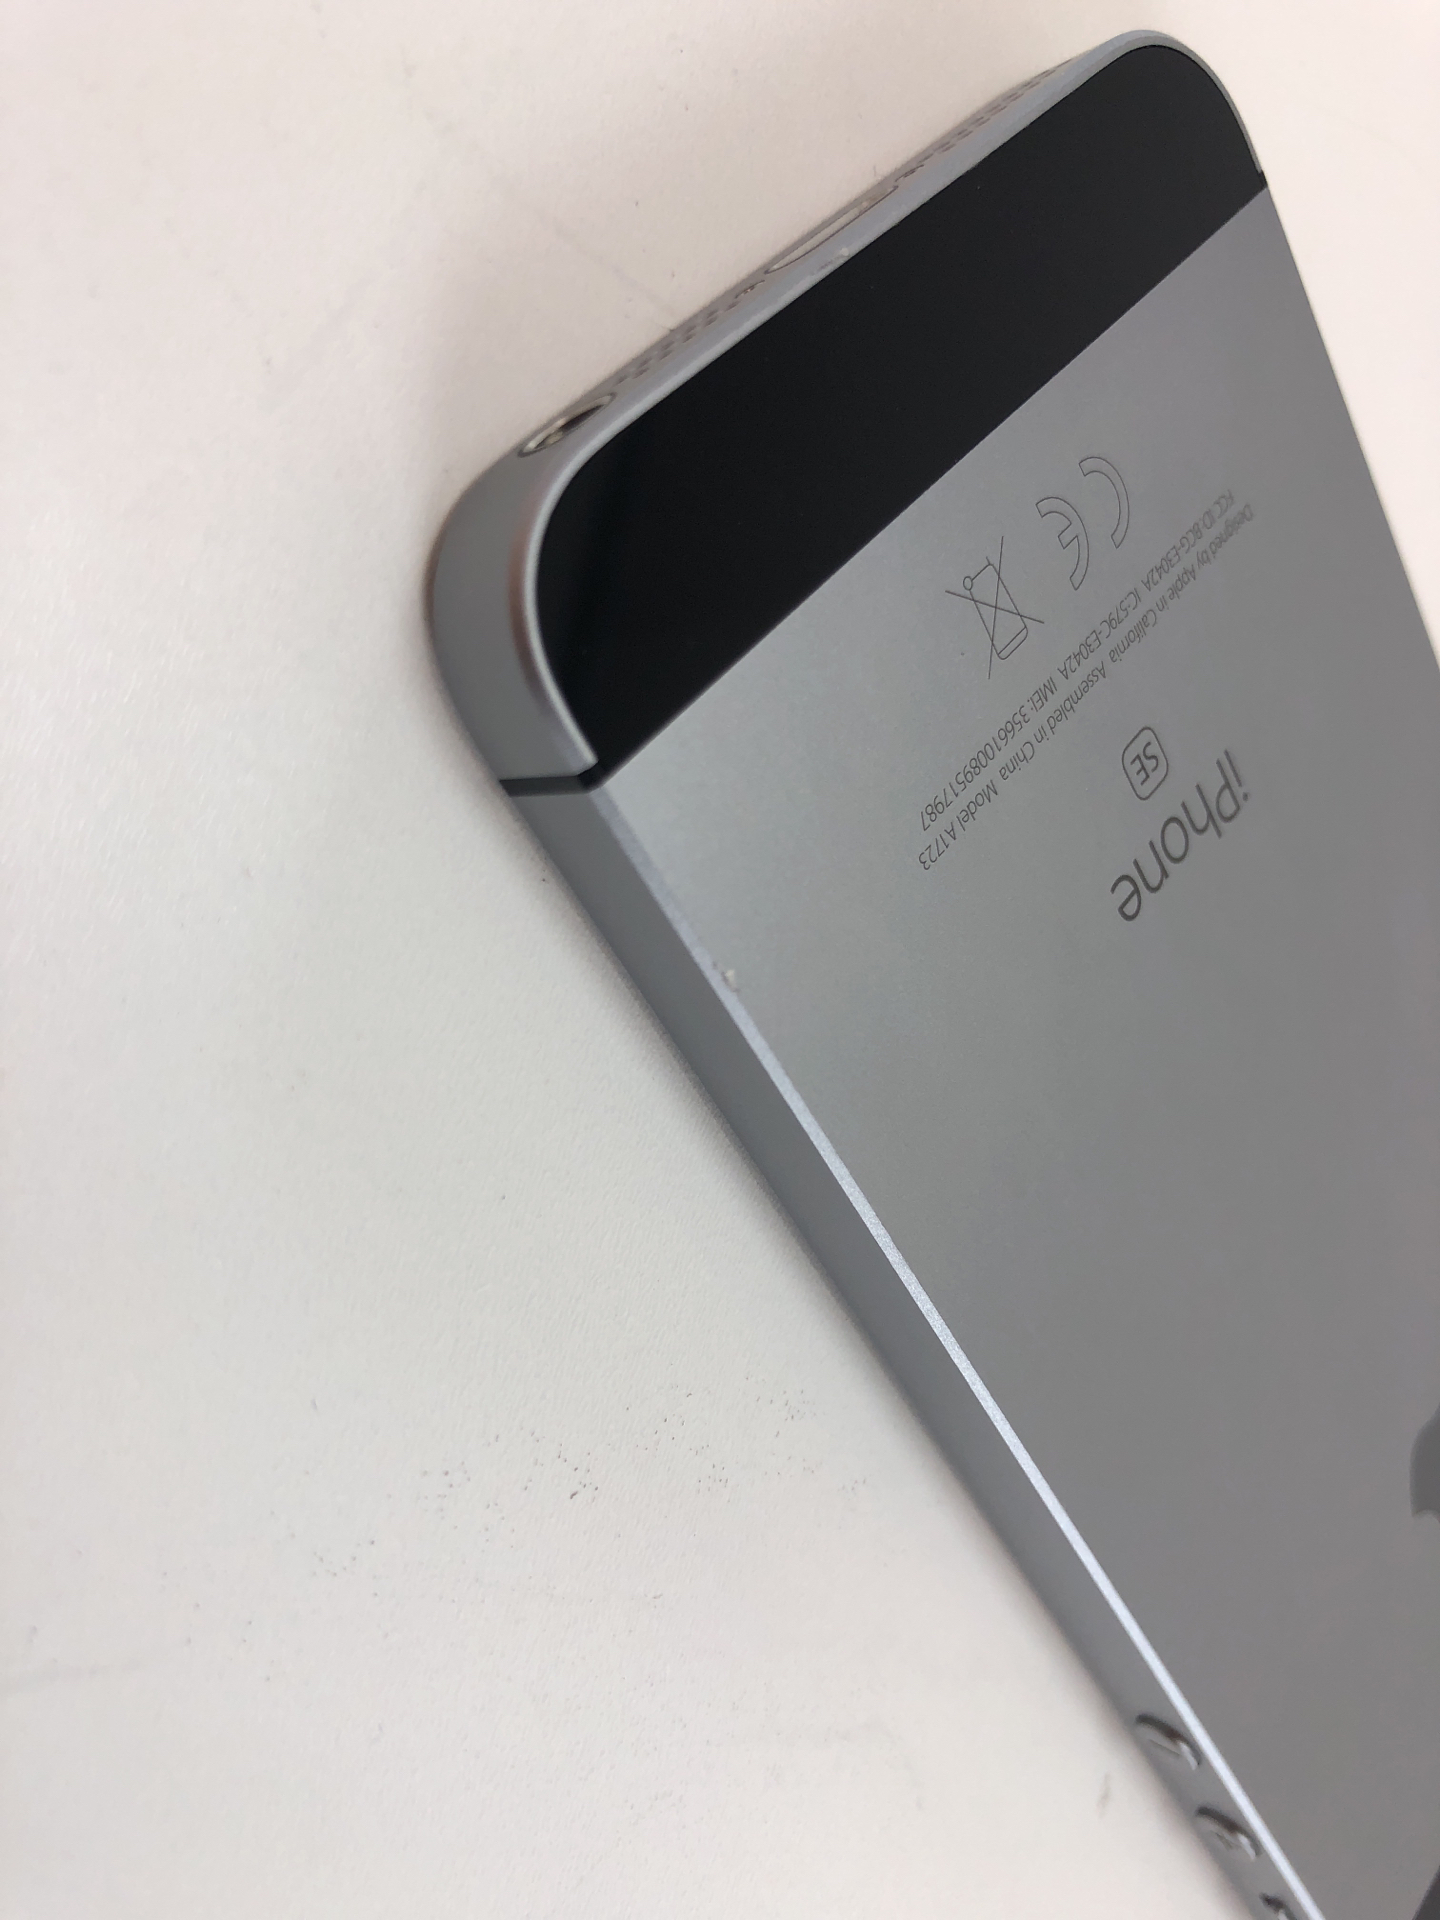 iPhone SE 32GB, 32GB, Space Gray, bild 5